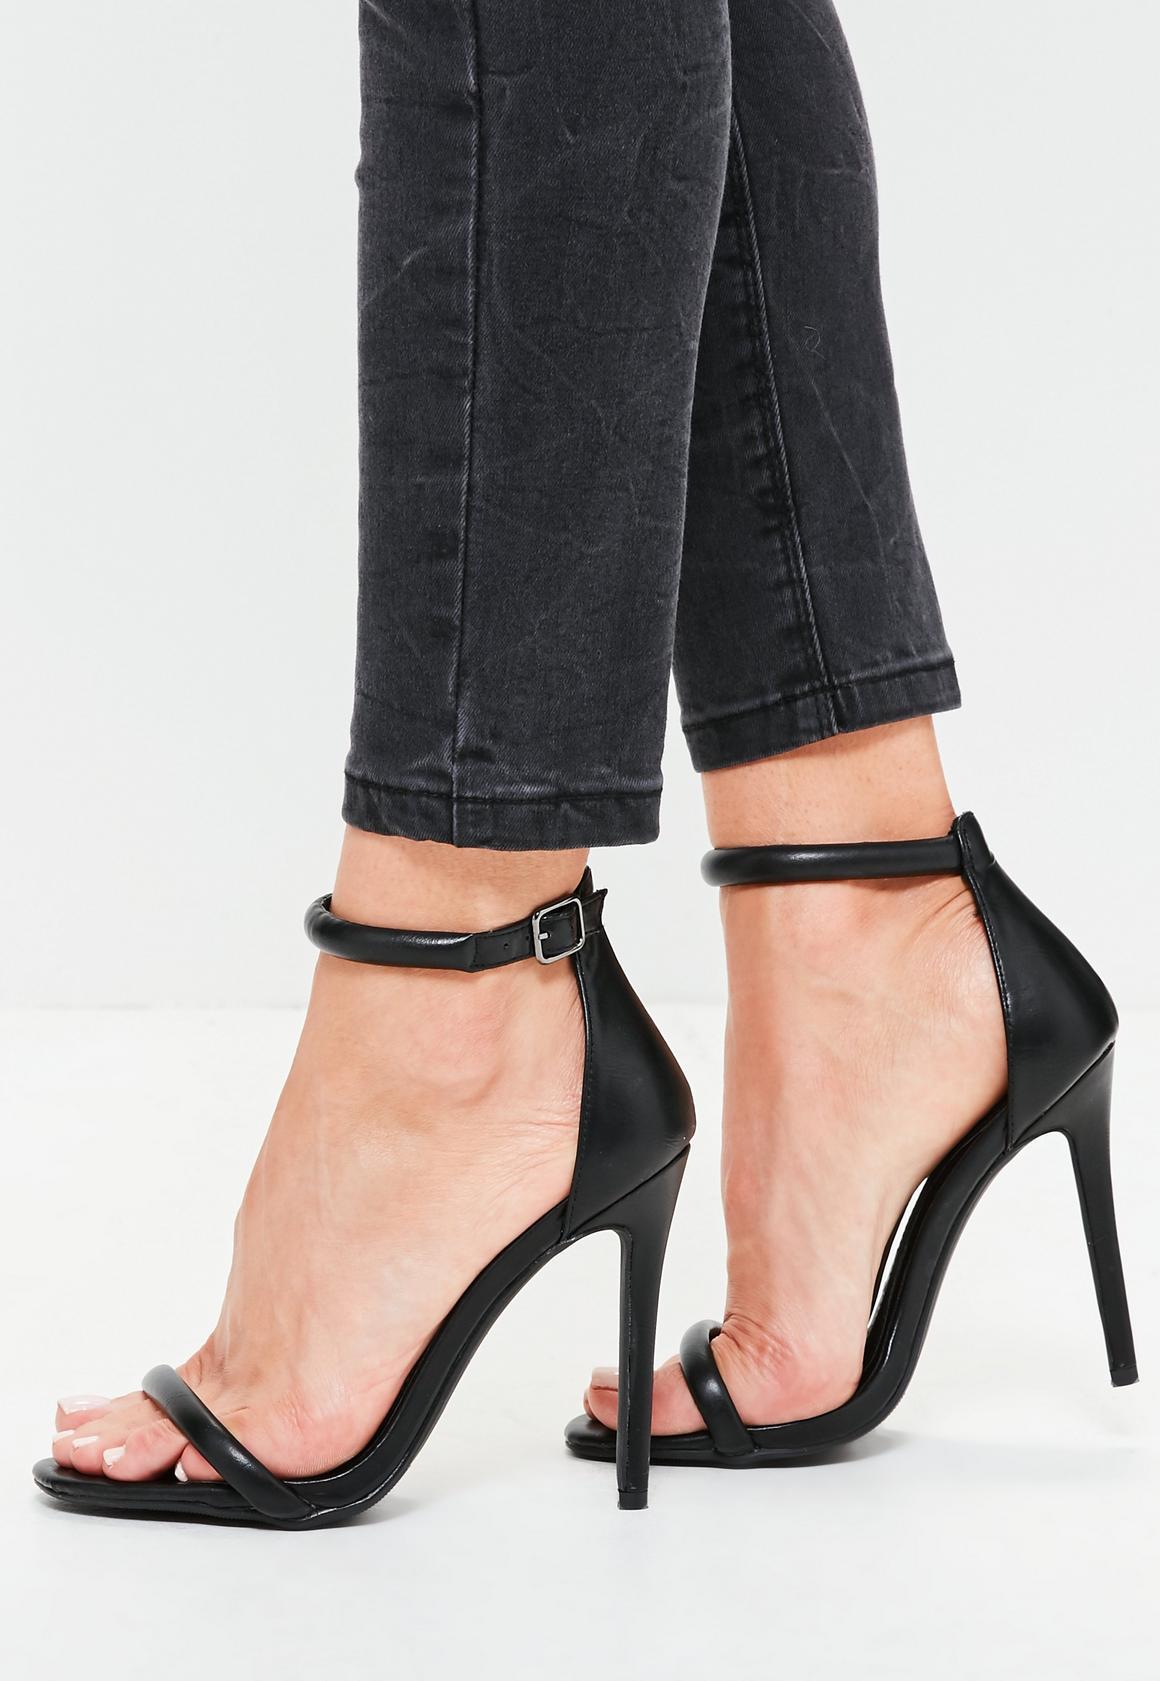 Black sandals missguided - Previous Next